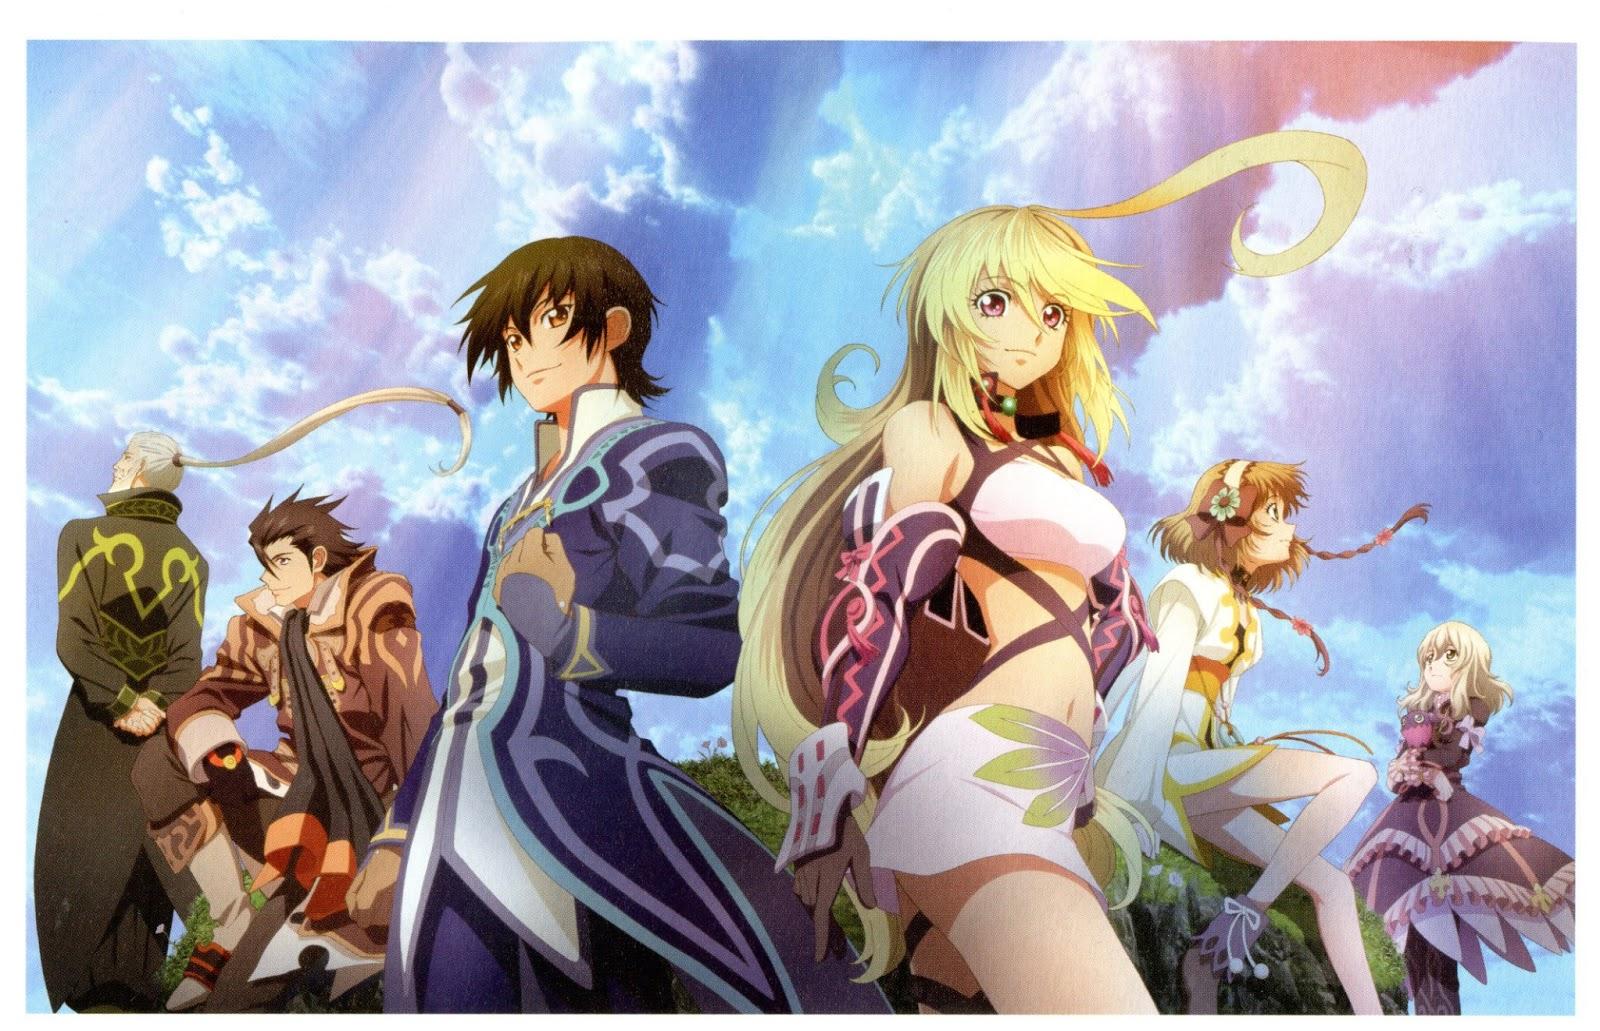 Tales of Xillia Anime Wallpaper